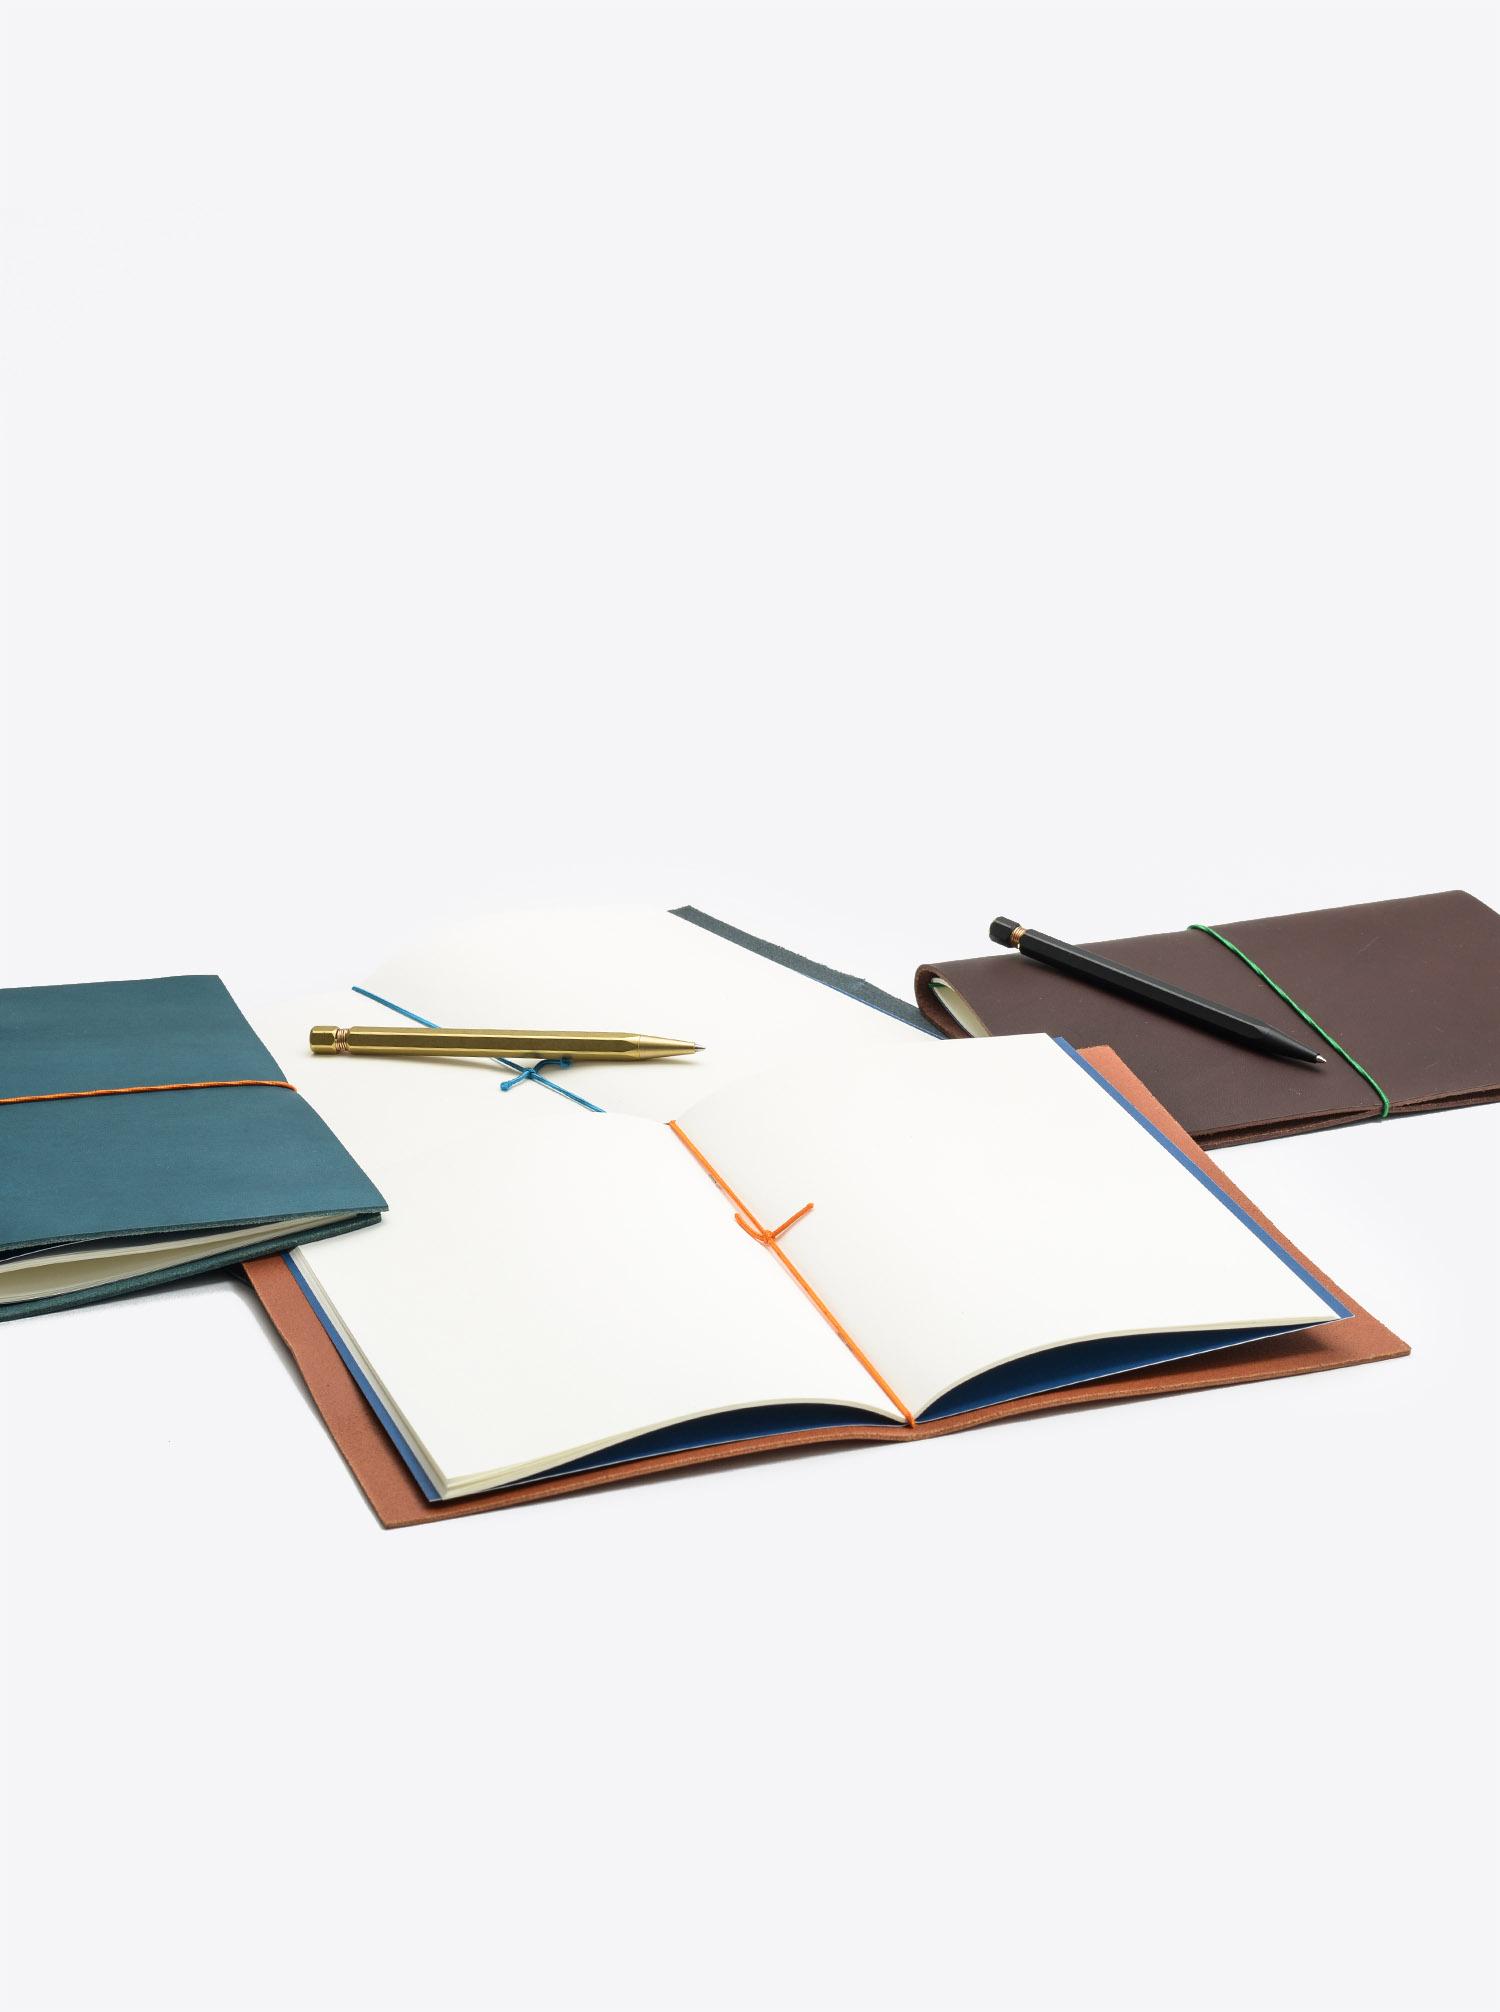 Notizbuch Grand Voyager XL Kernleder Cognac